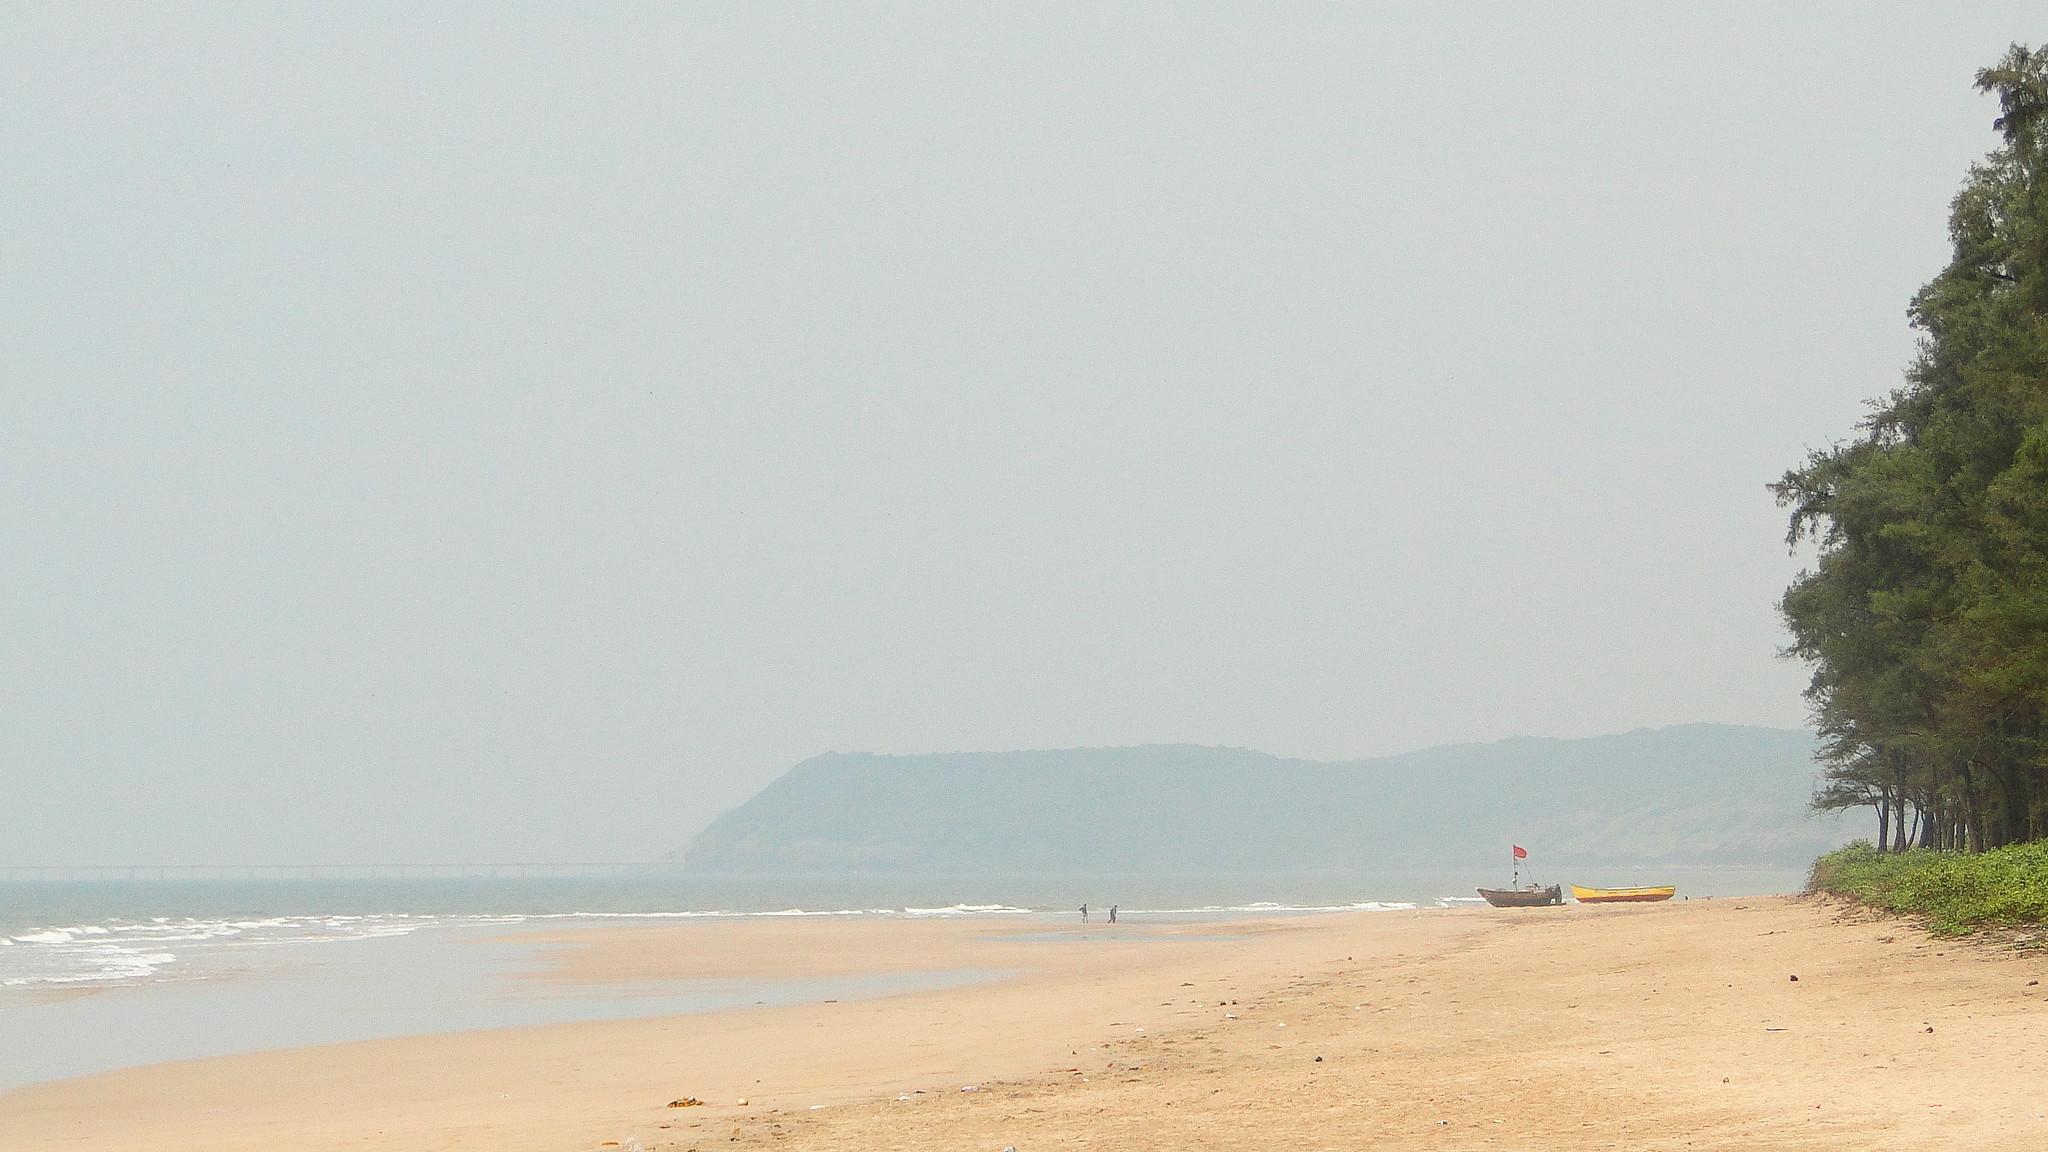 Guhagar Is Best Beach To Visit in Ratnagiri